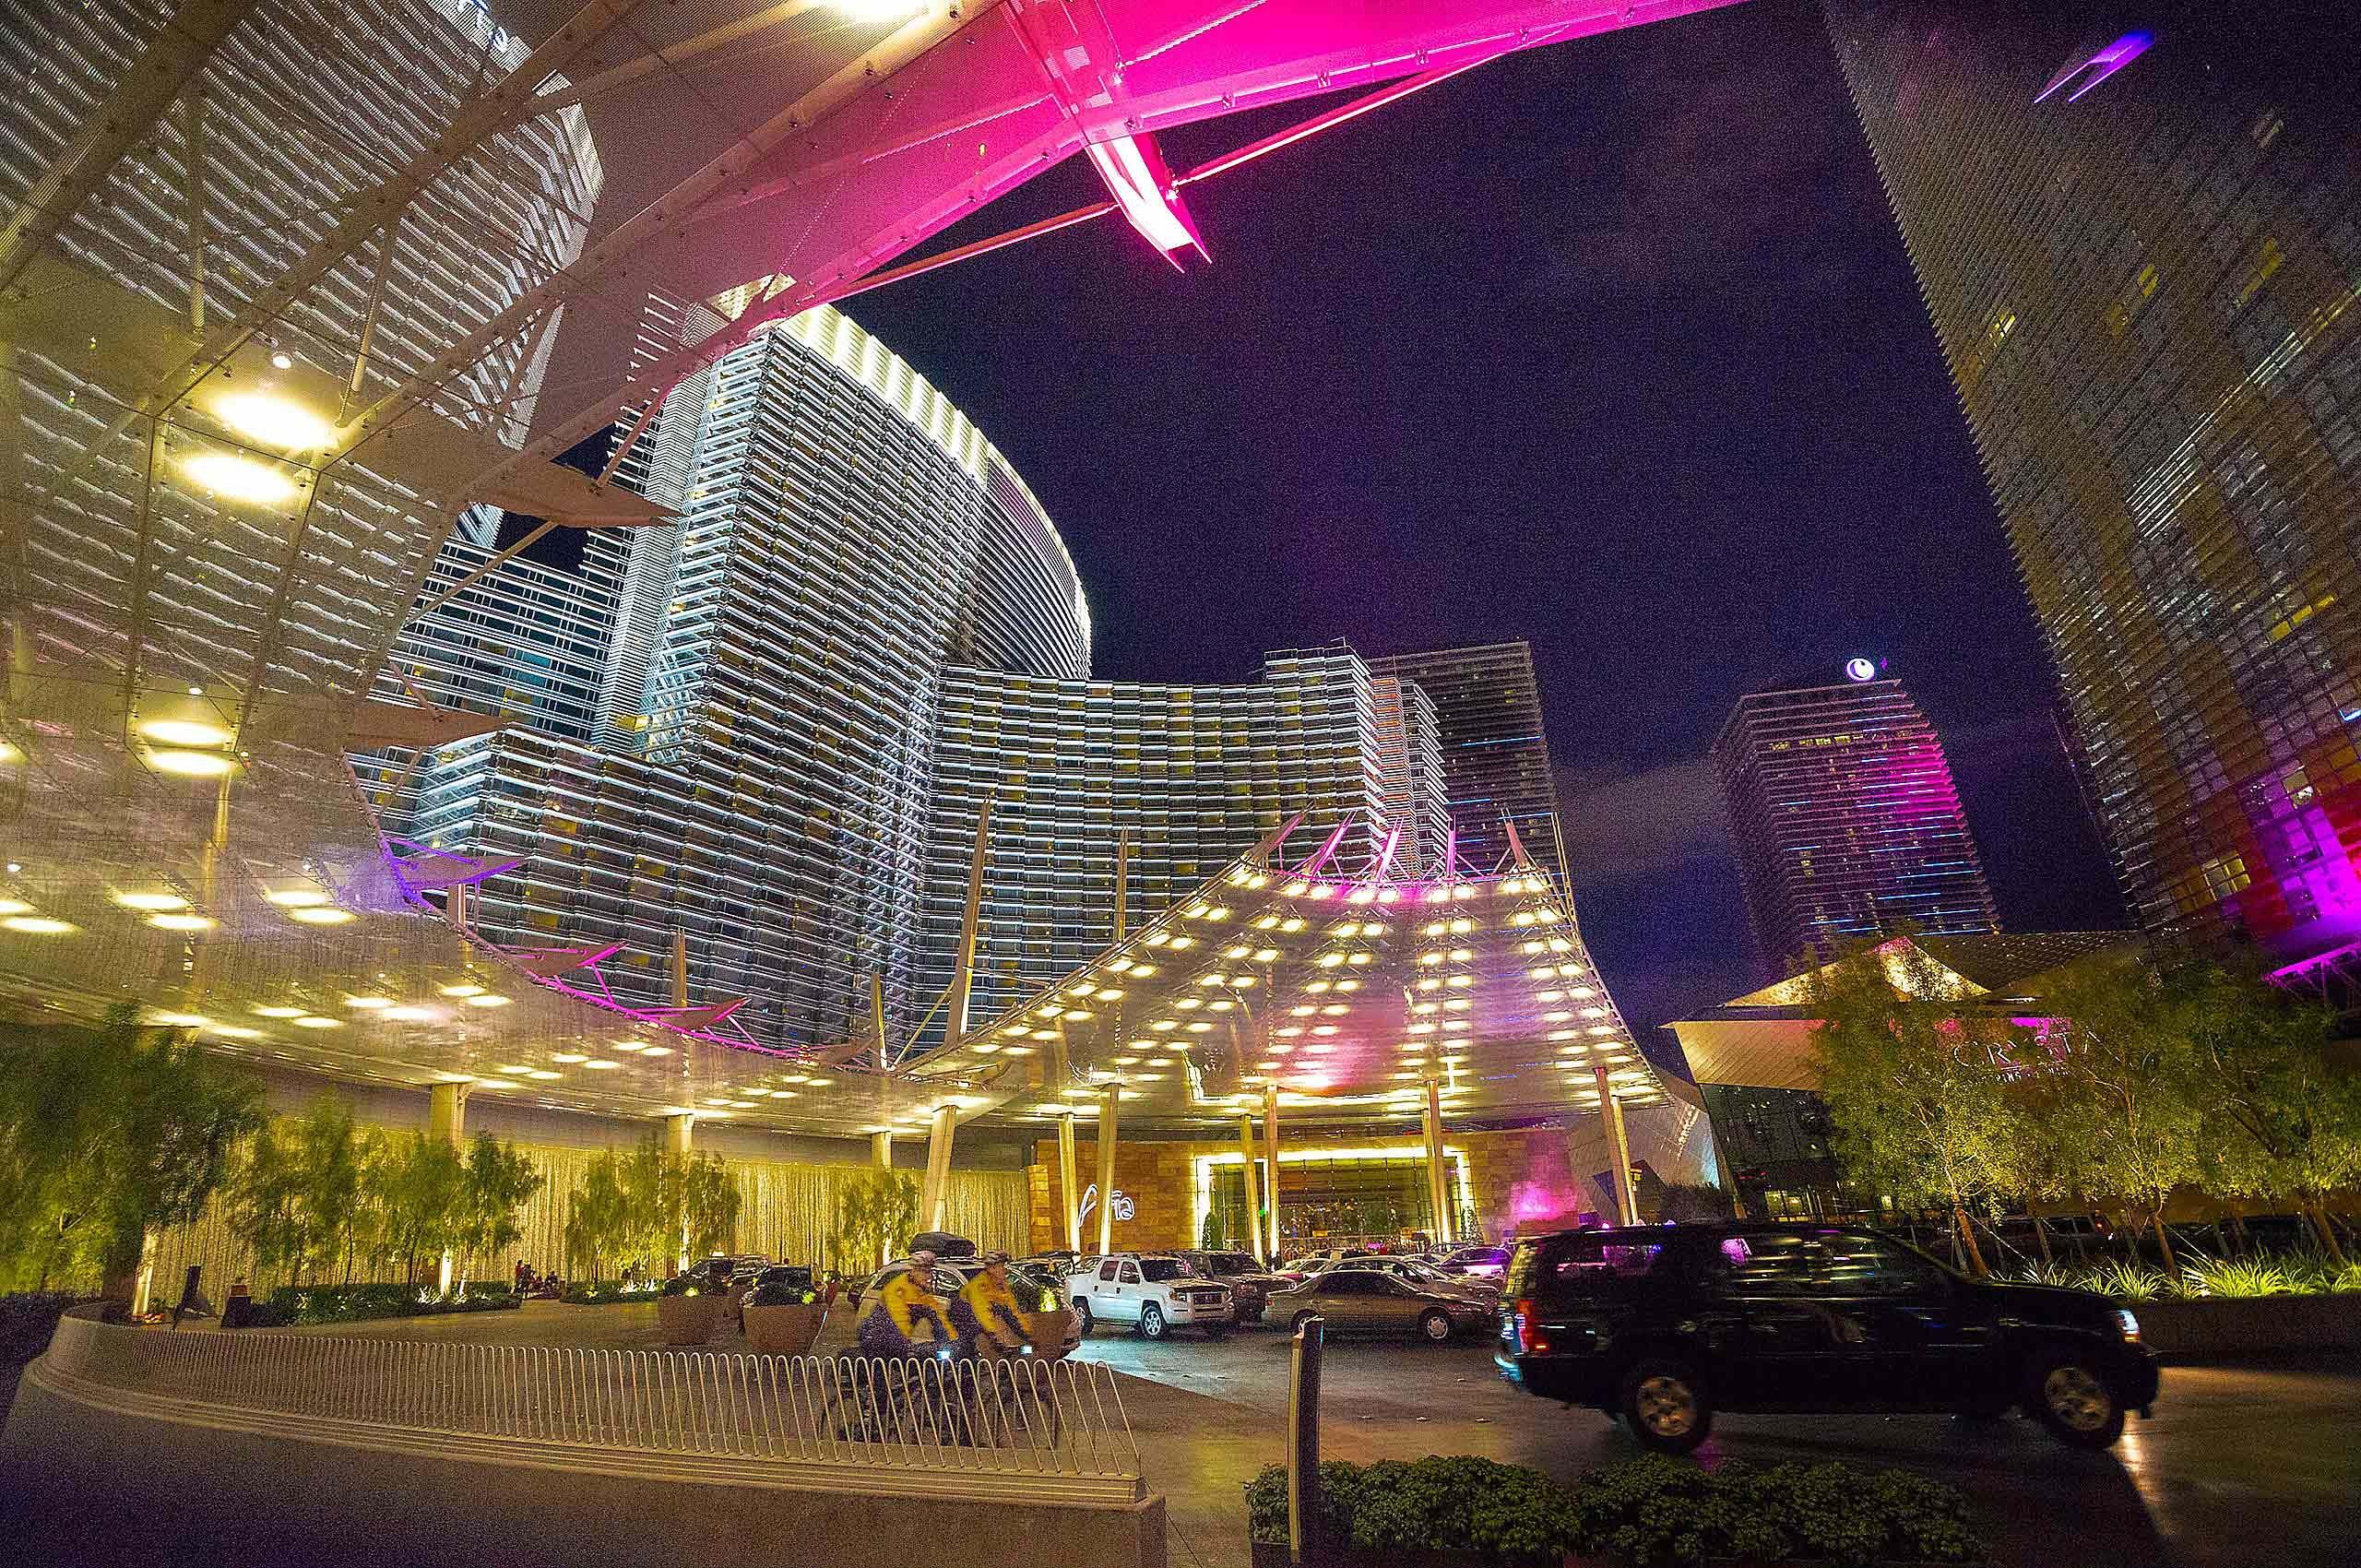 Los Vagas hotel at night